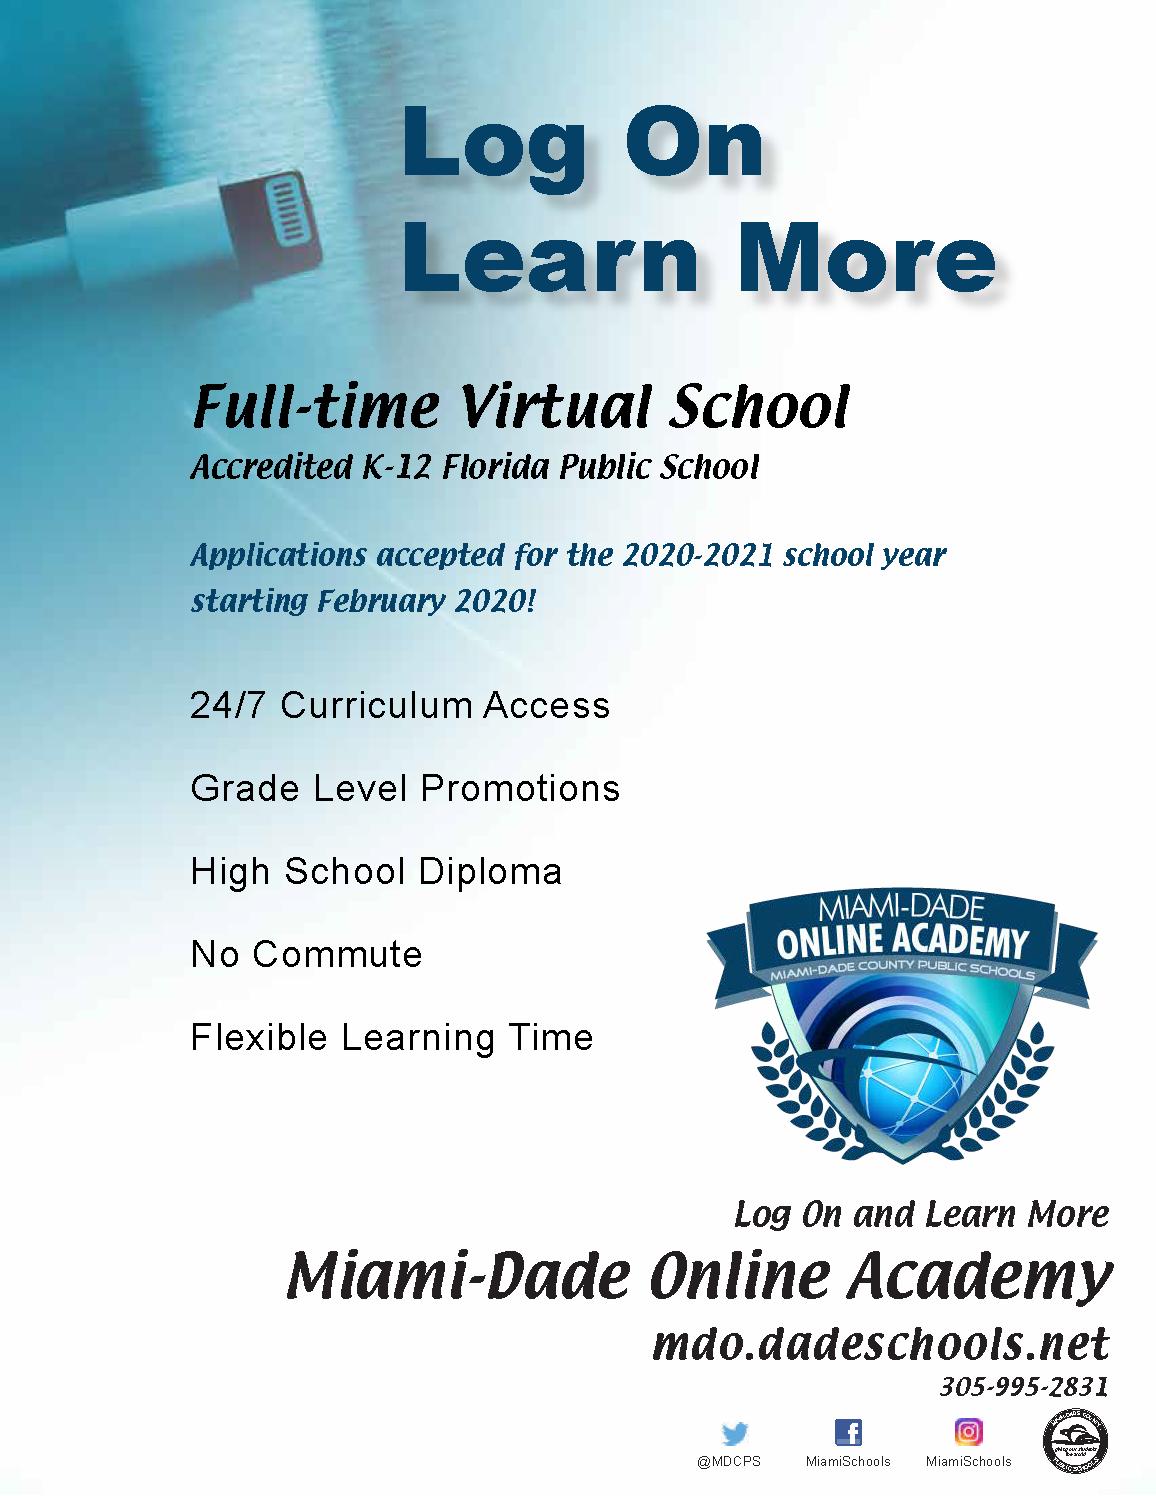 Mdcps Calendar 2022.2020 2021 Open Enrollment Period For District S Full Time Virtual School Southwest Miami Senior High